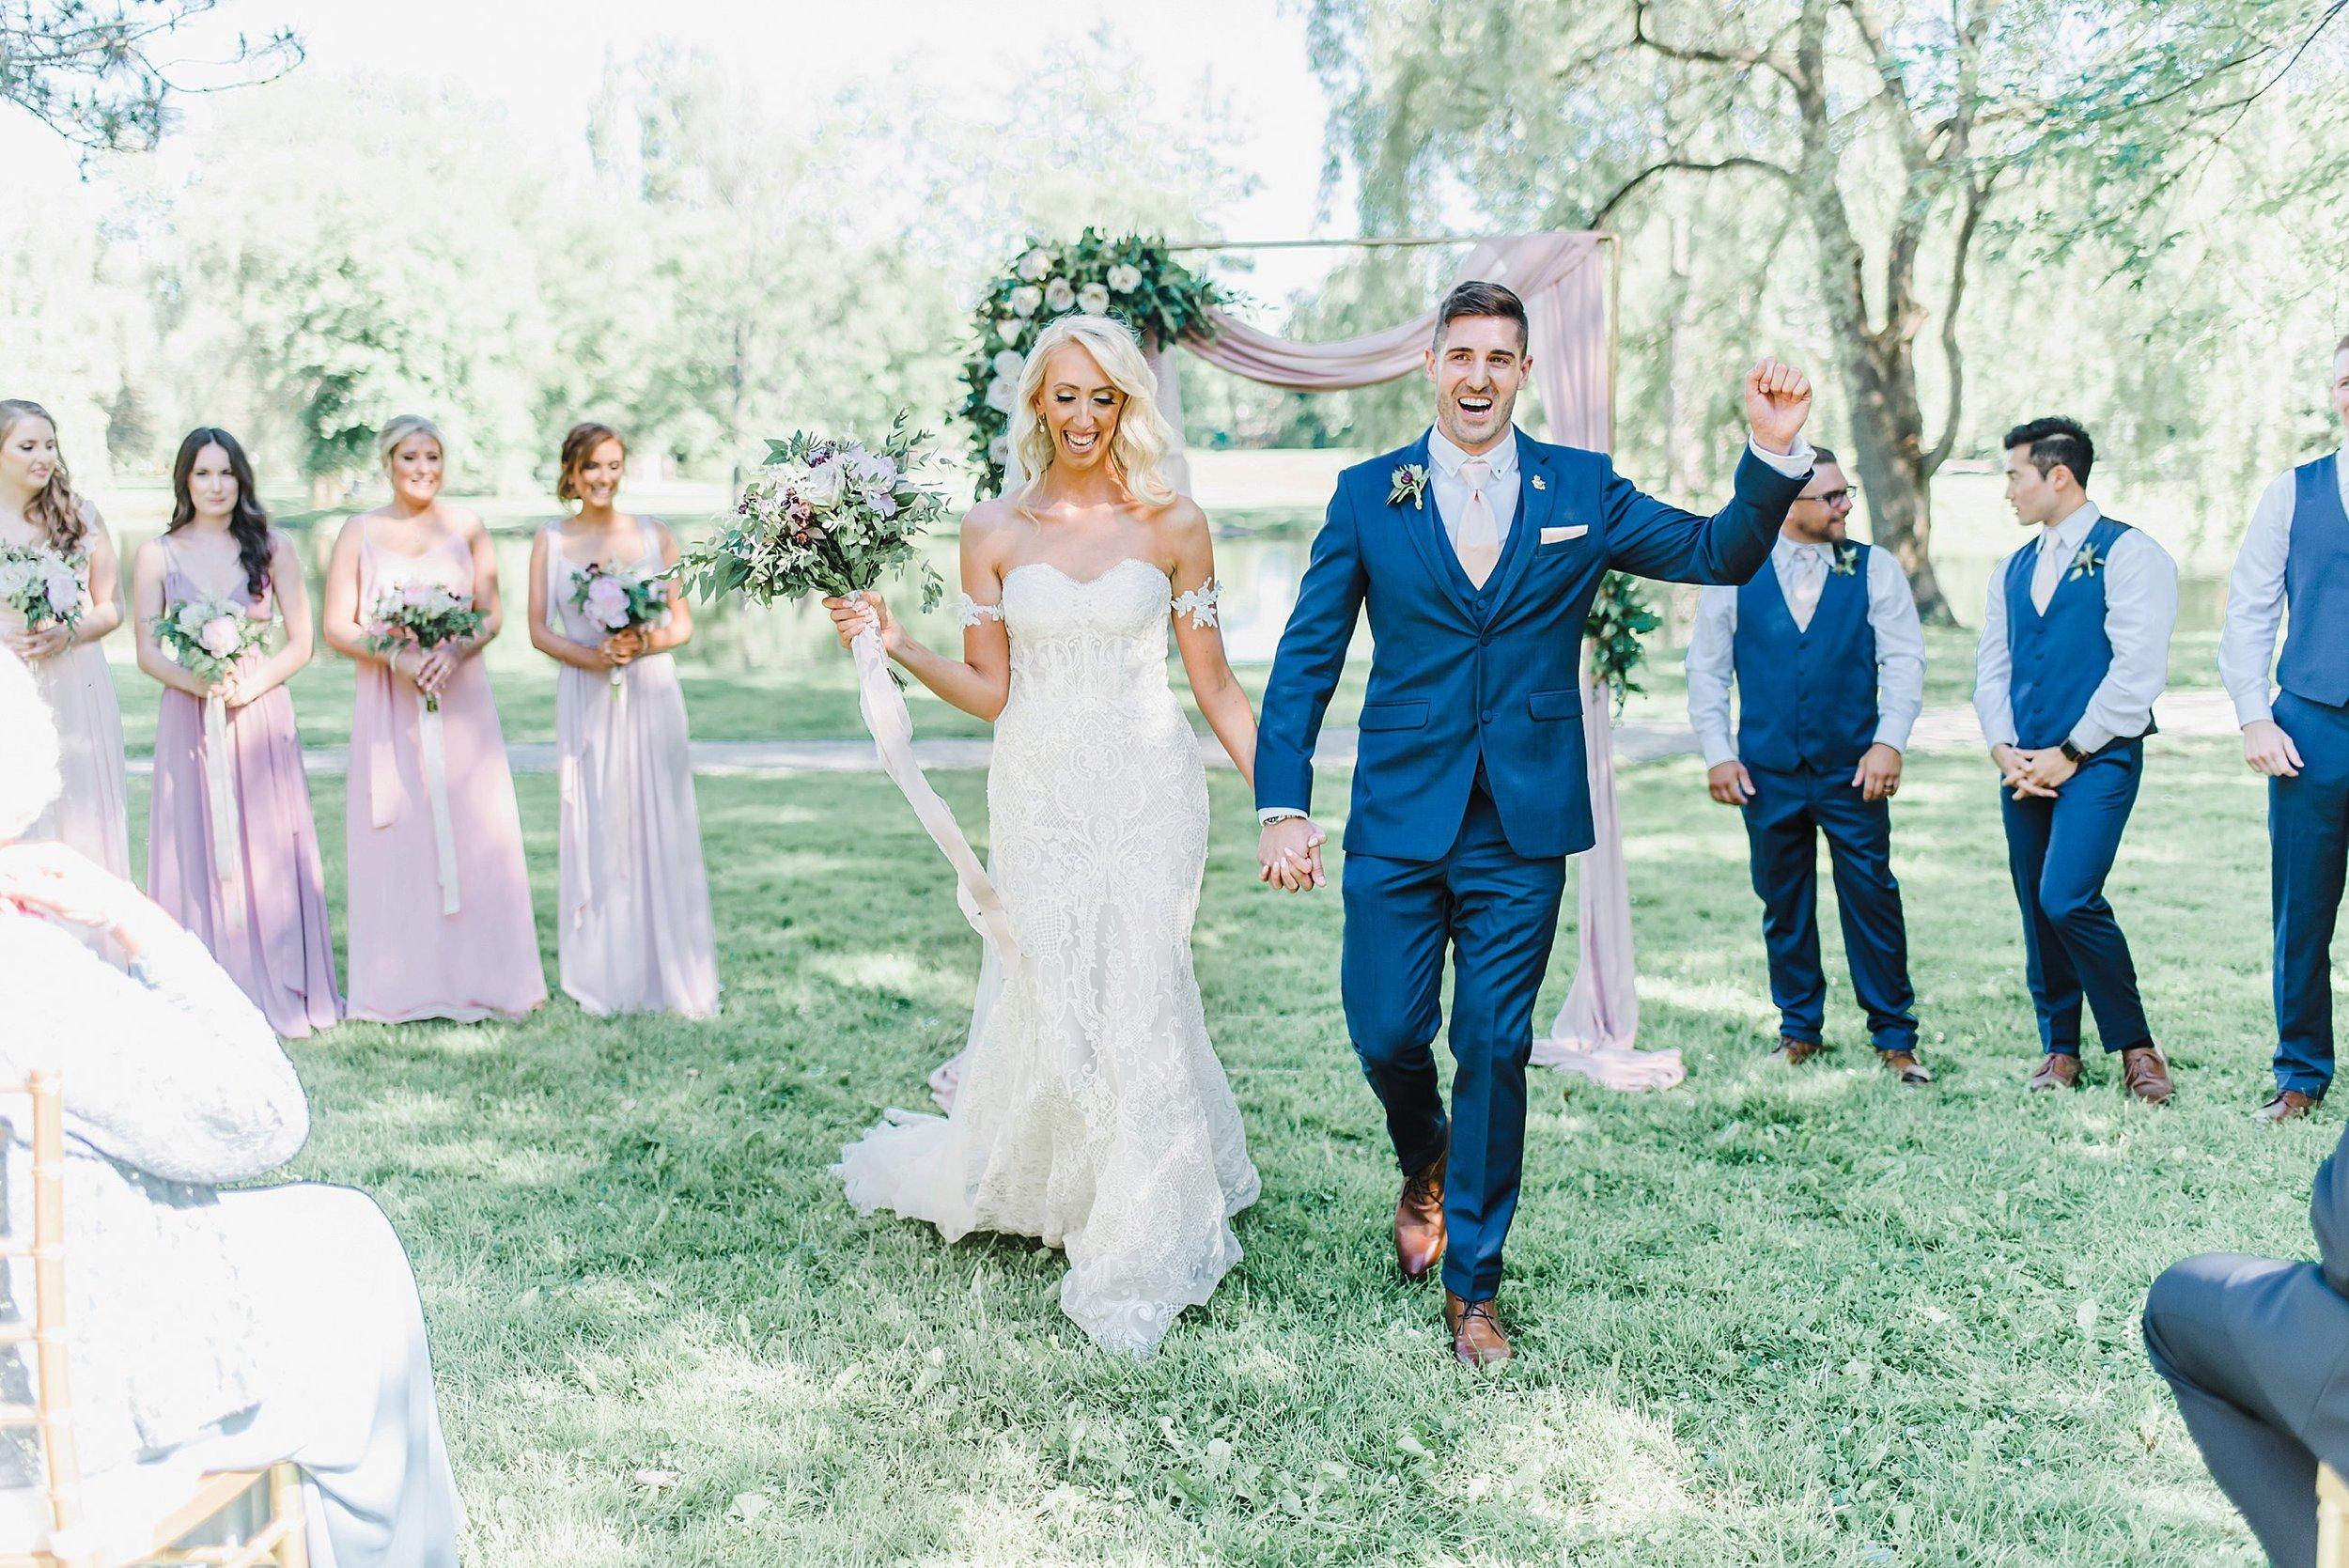 light airy indie fine art ottawa wedding photographer | Ali and Batoul Photography_0071.jpg